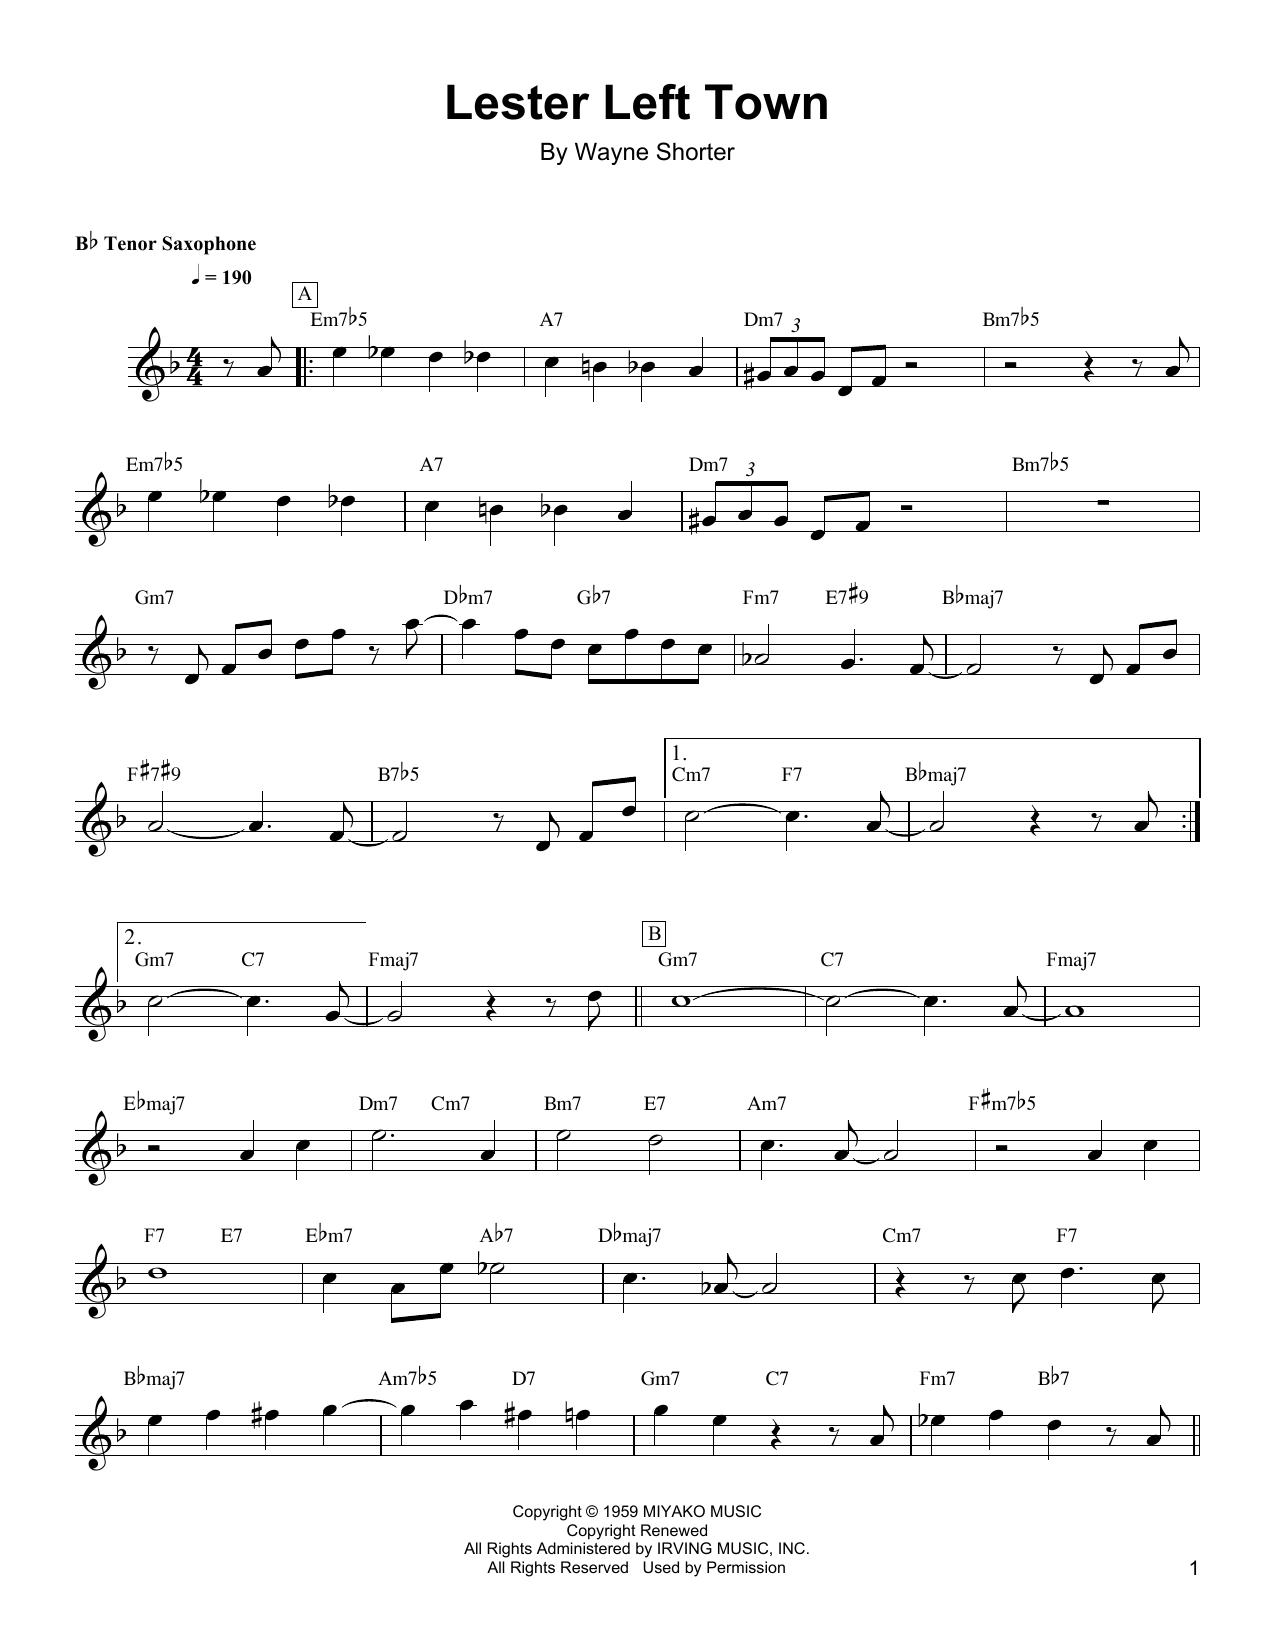 Wayne Shorter Lester Left Town sheet music notes and chords. Download Printable PDF.